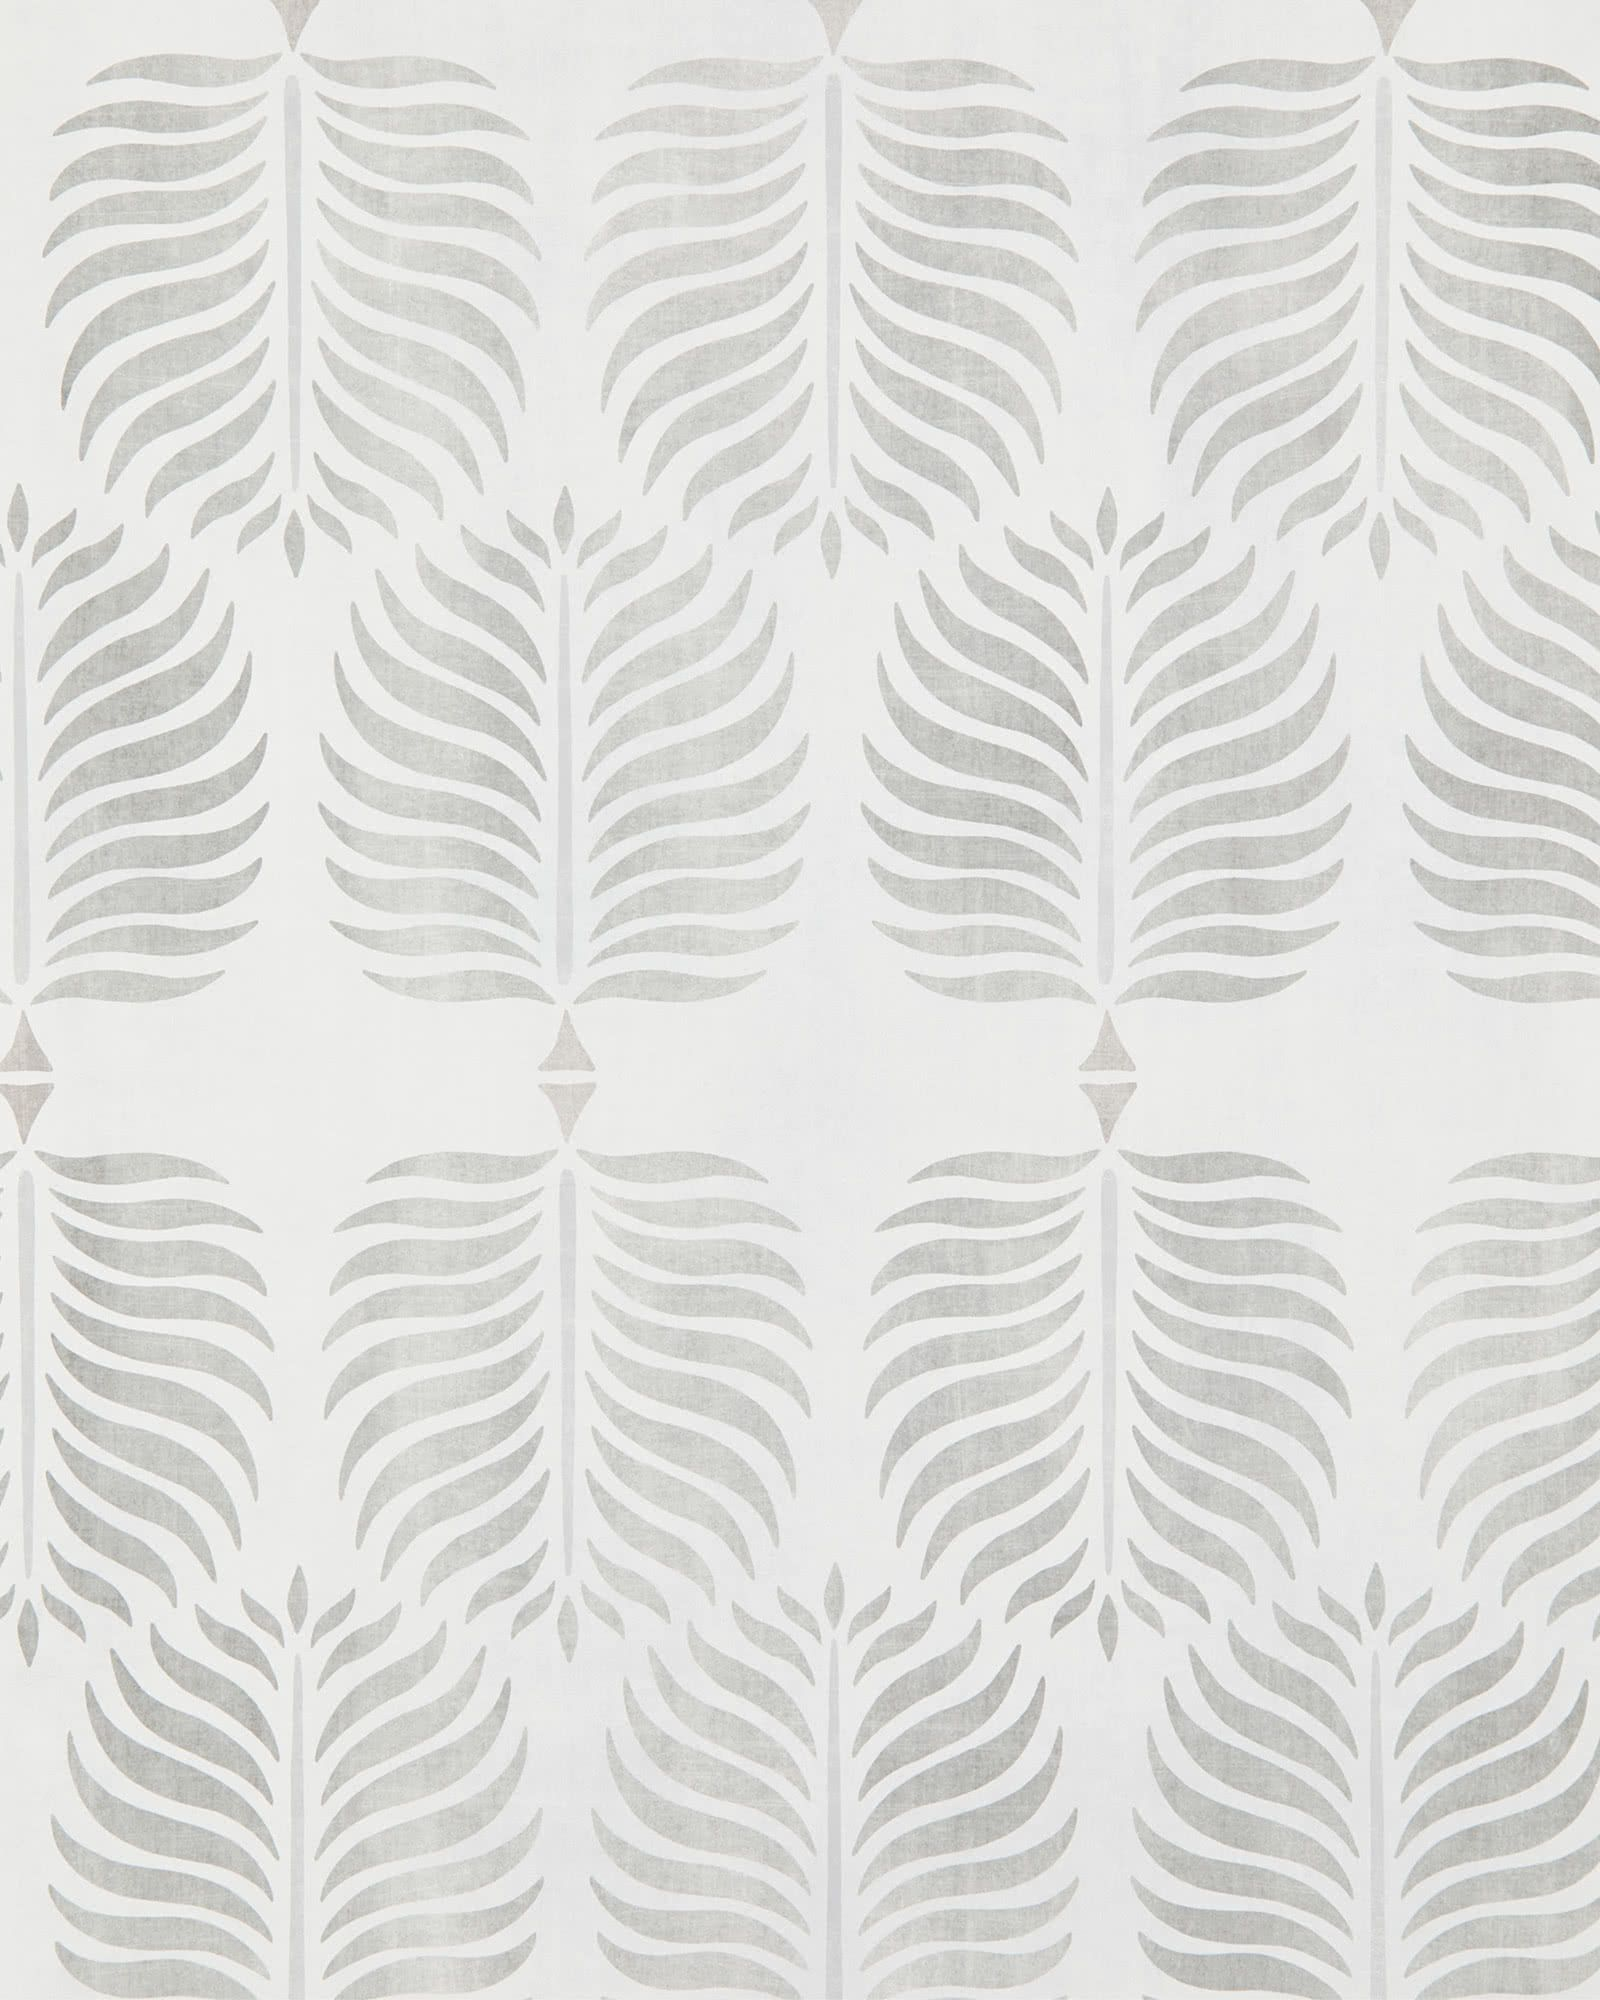 Granada Wallpaper Serena And Lily Wallpaper Grey And White Wallpaper Wallpapered Entryway